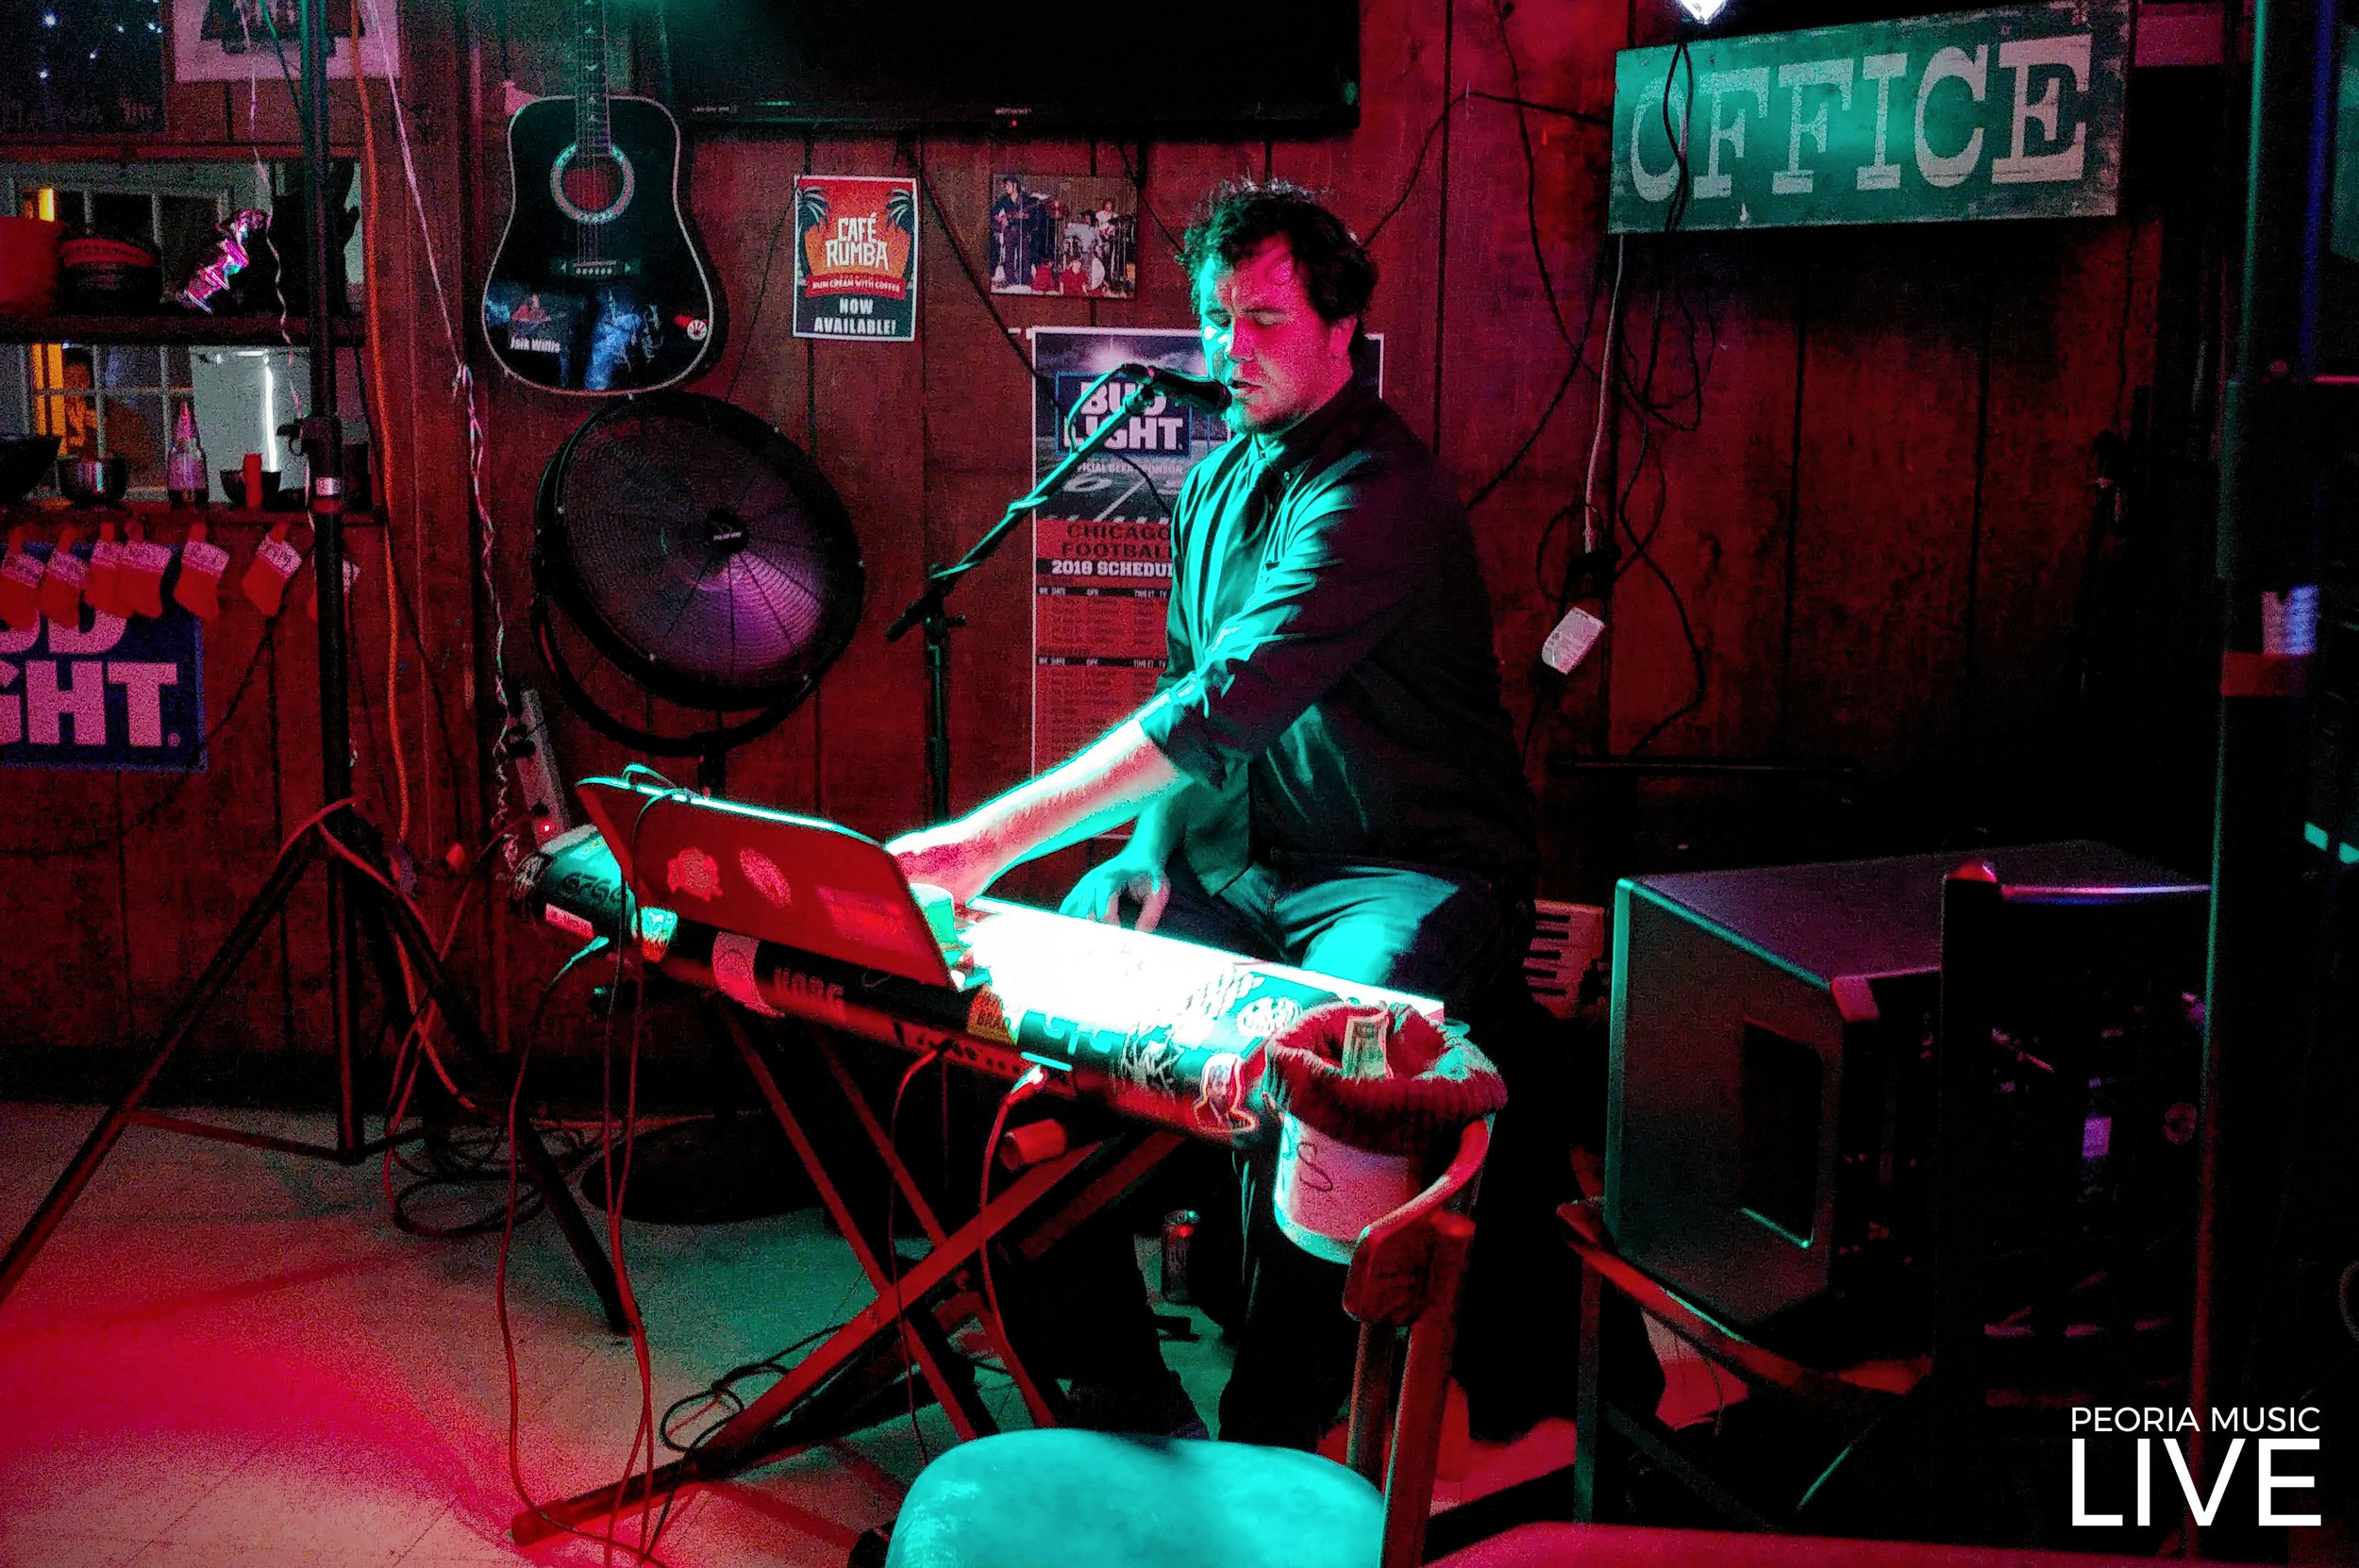 Piano Man Chris Tarpley on NYE at Office on Main in Morton